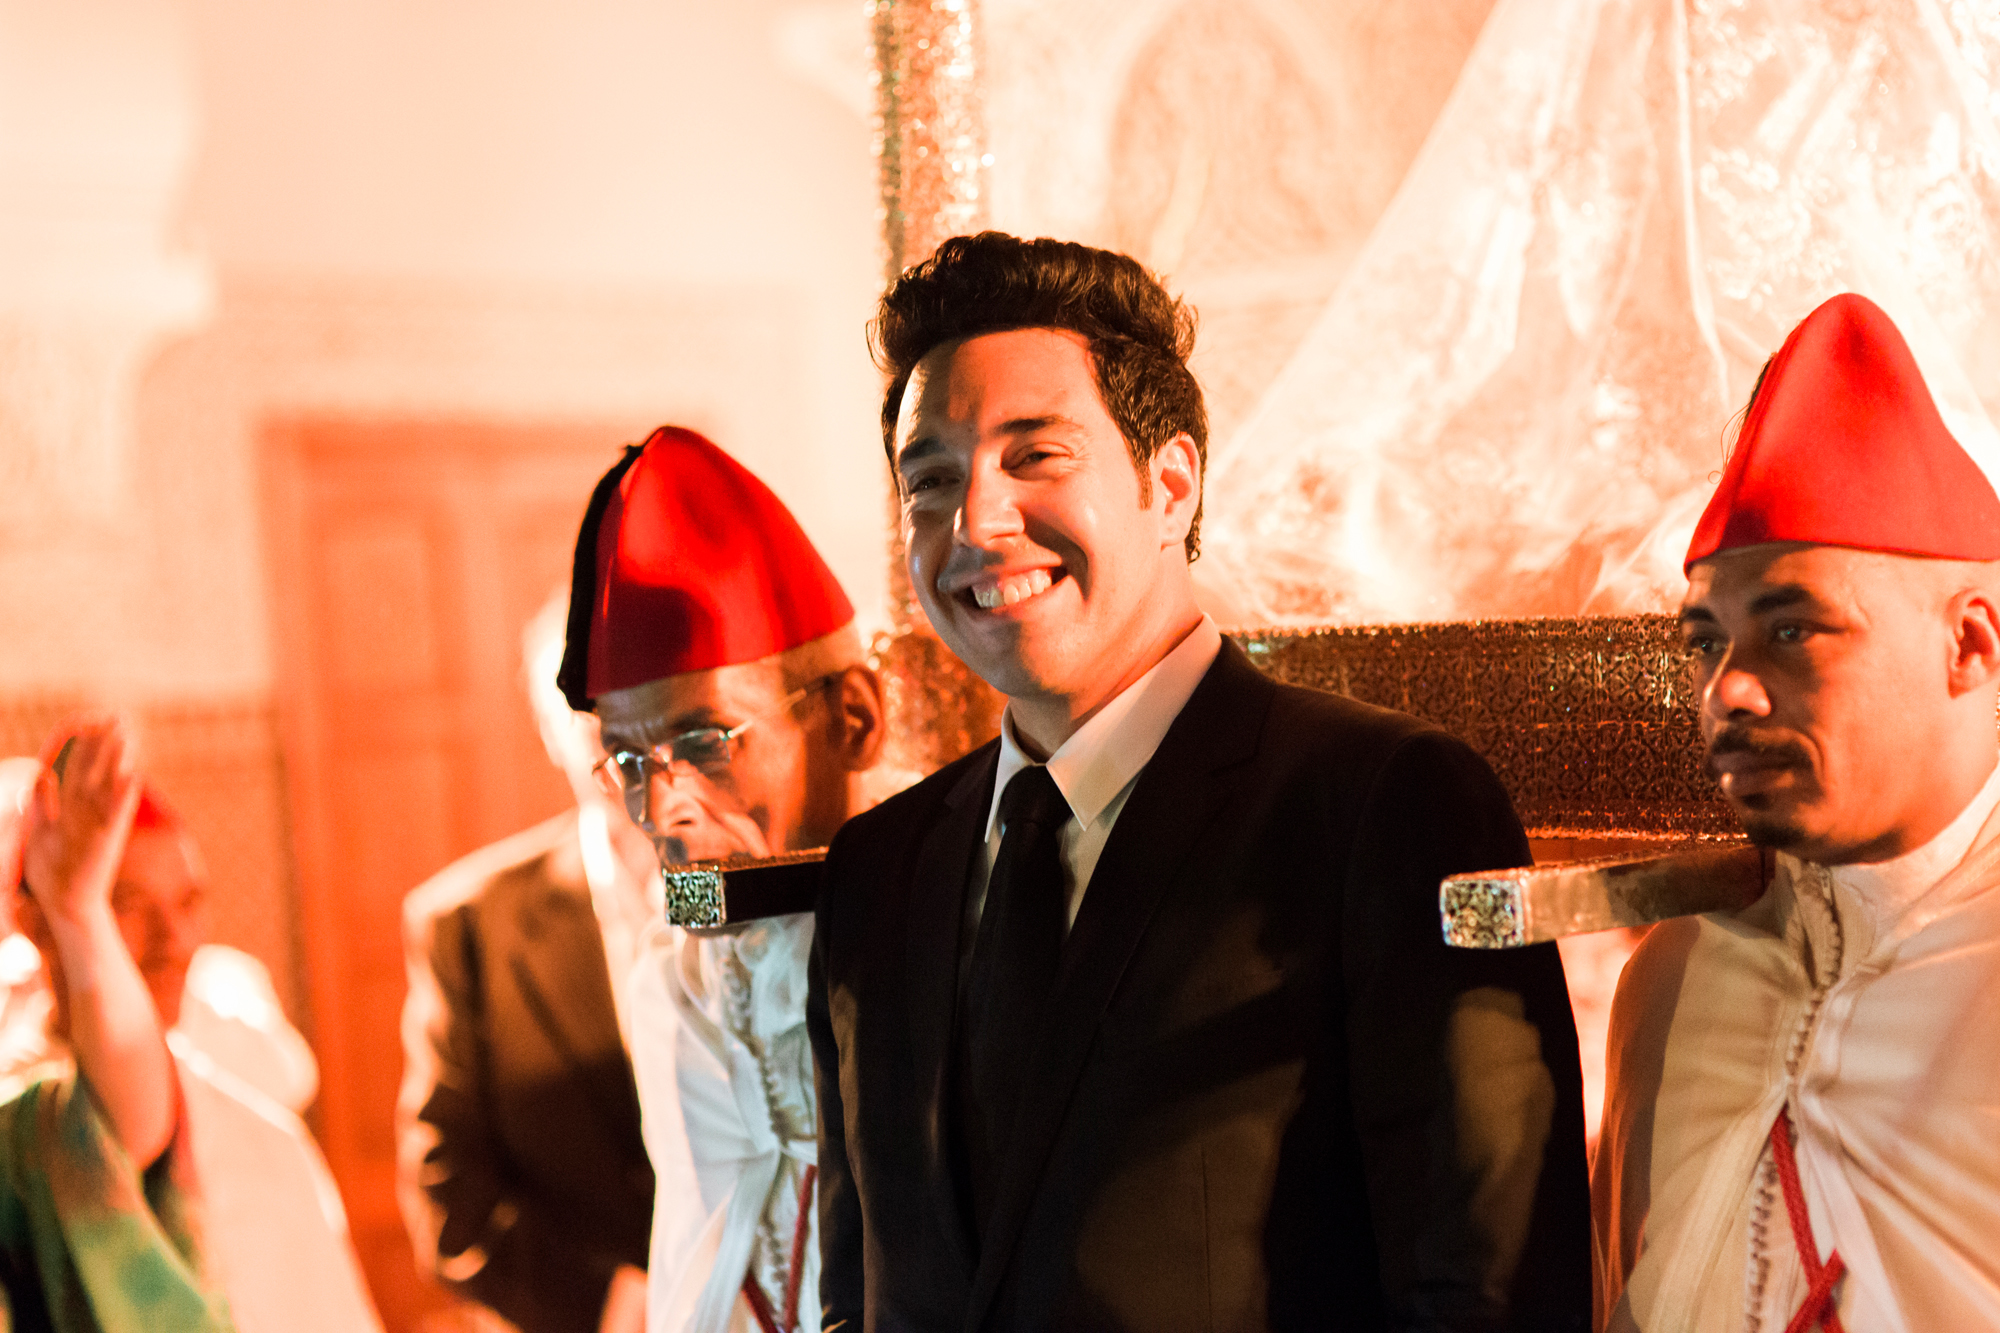 marrakech-morocco-destination-wedding-lilouette-25.jpg